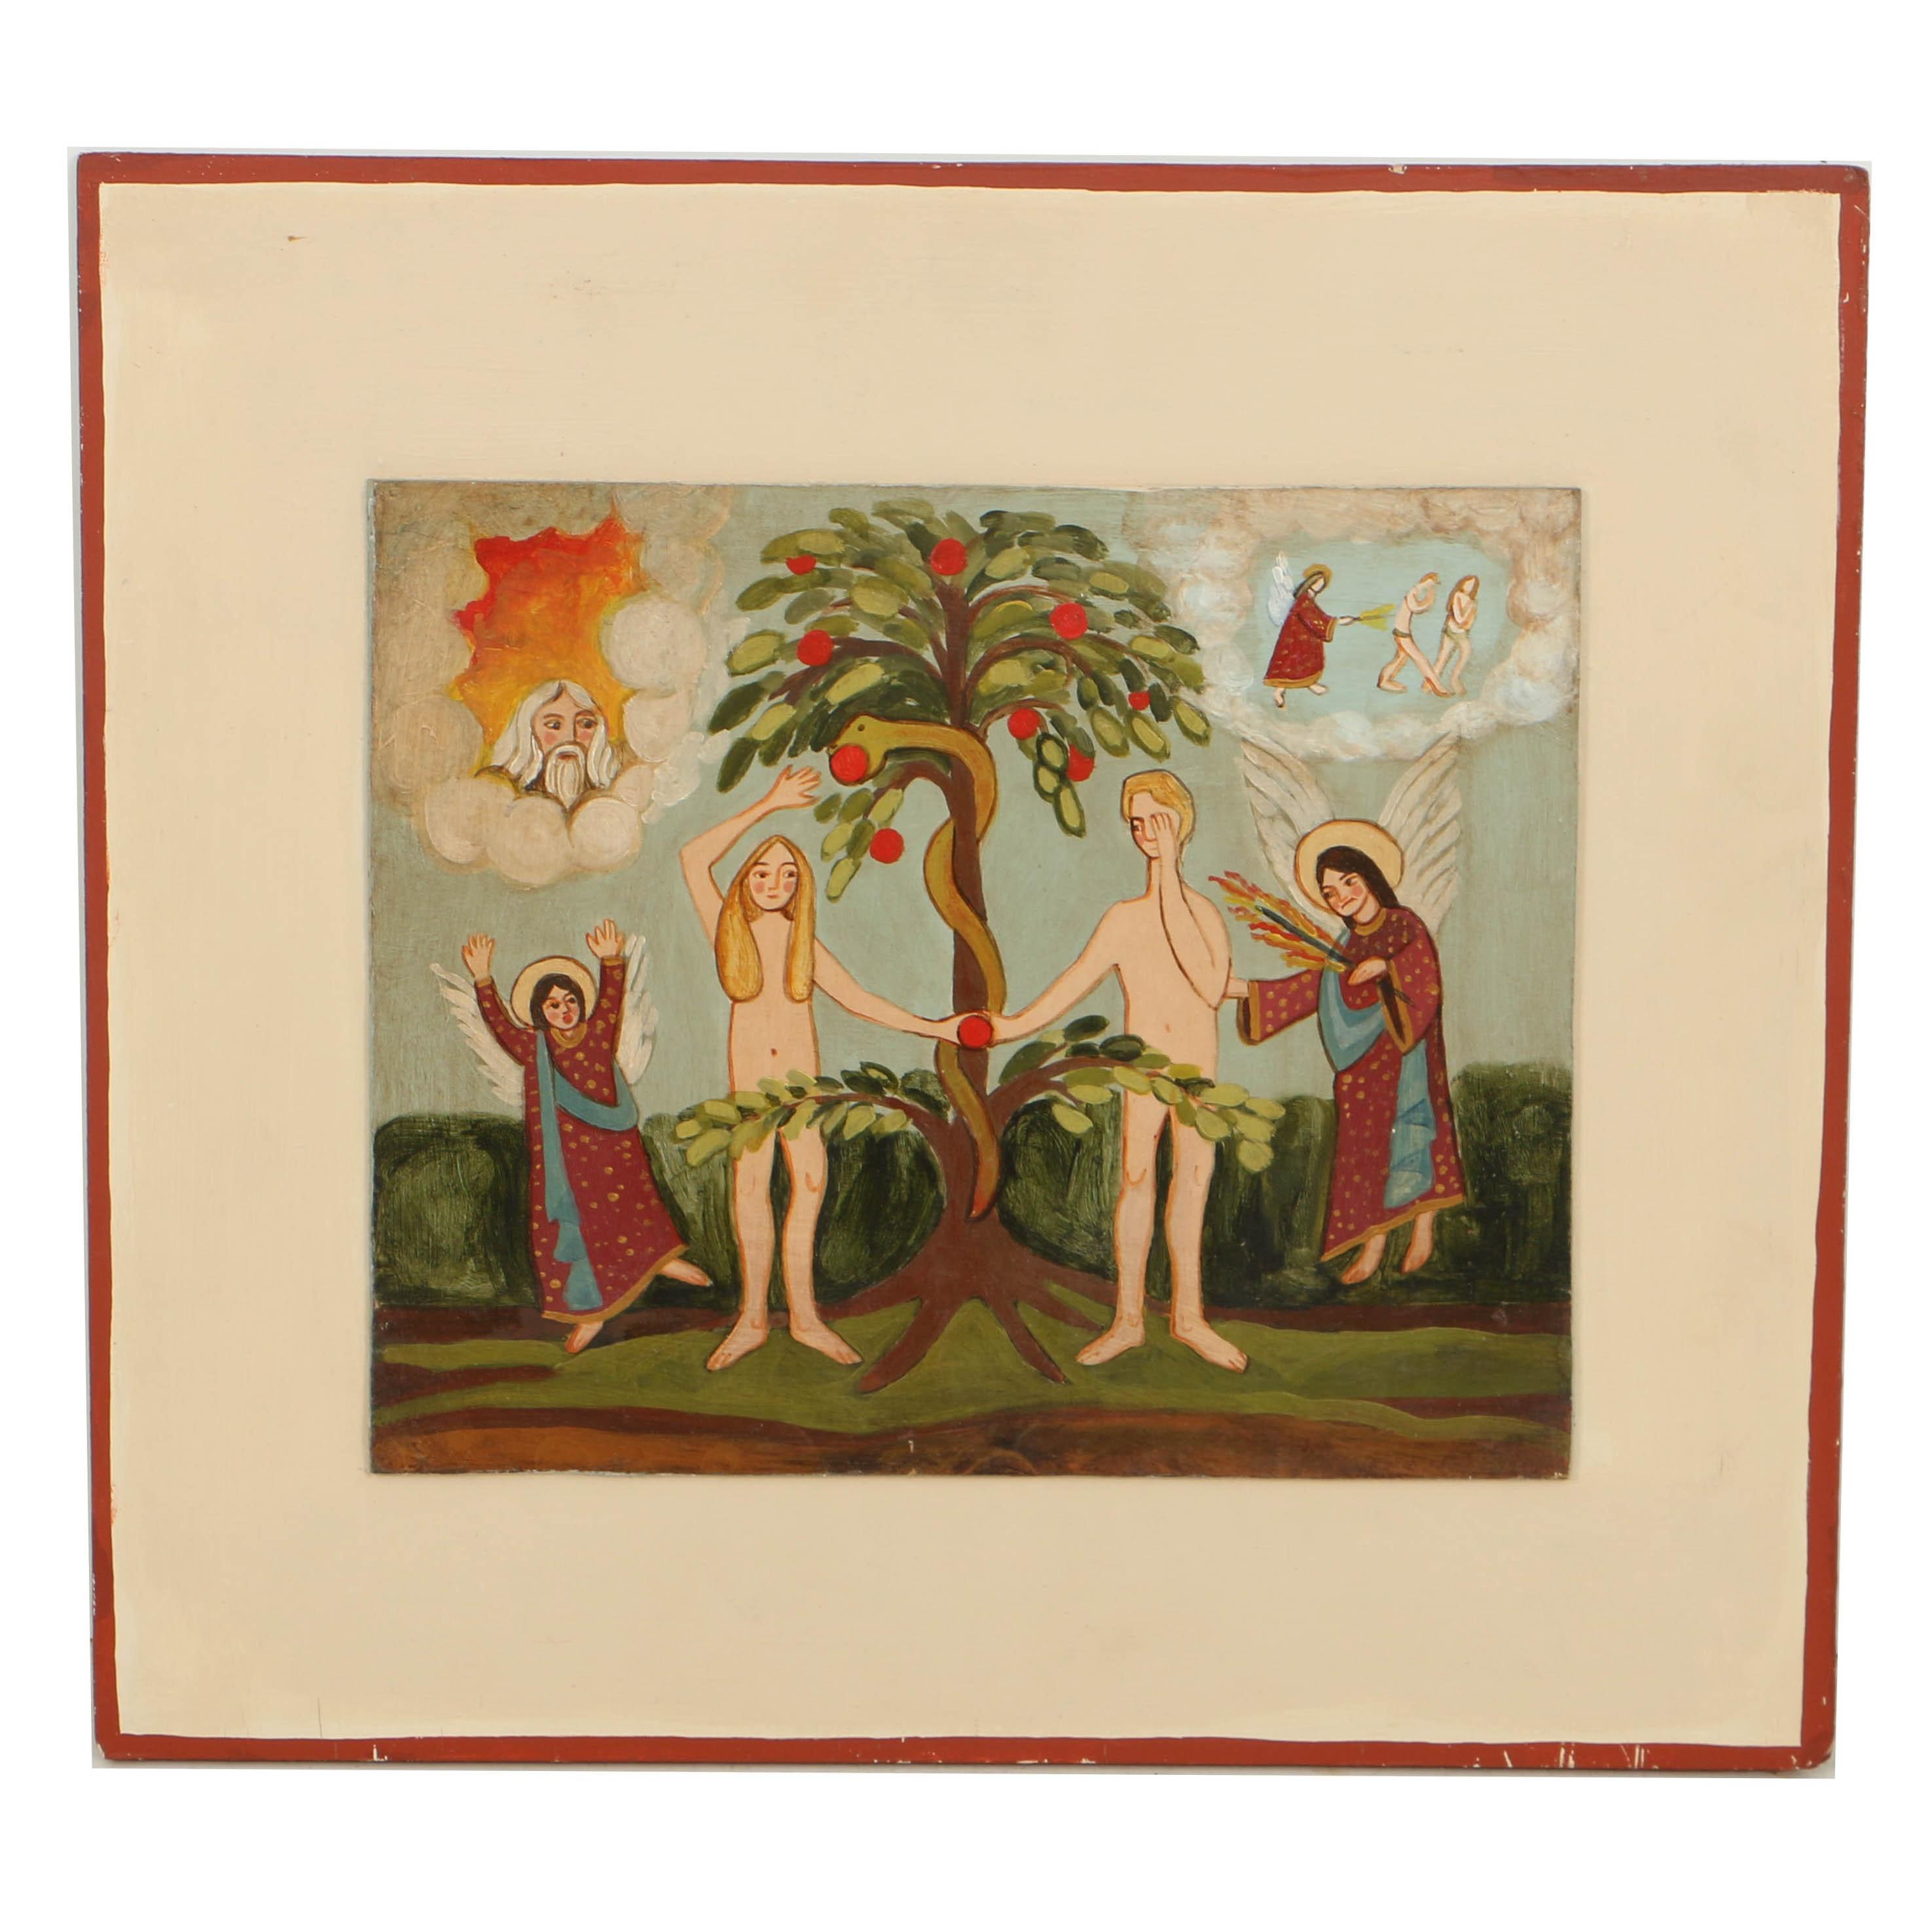 Vintage Folk Art Oil Painting on Wood Panel of the Fall of Man